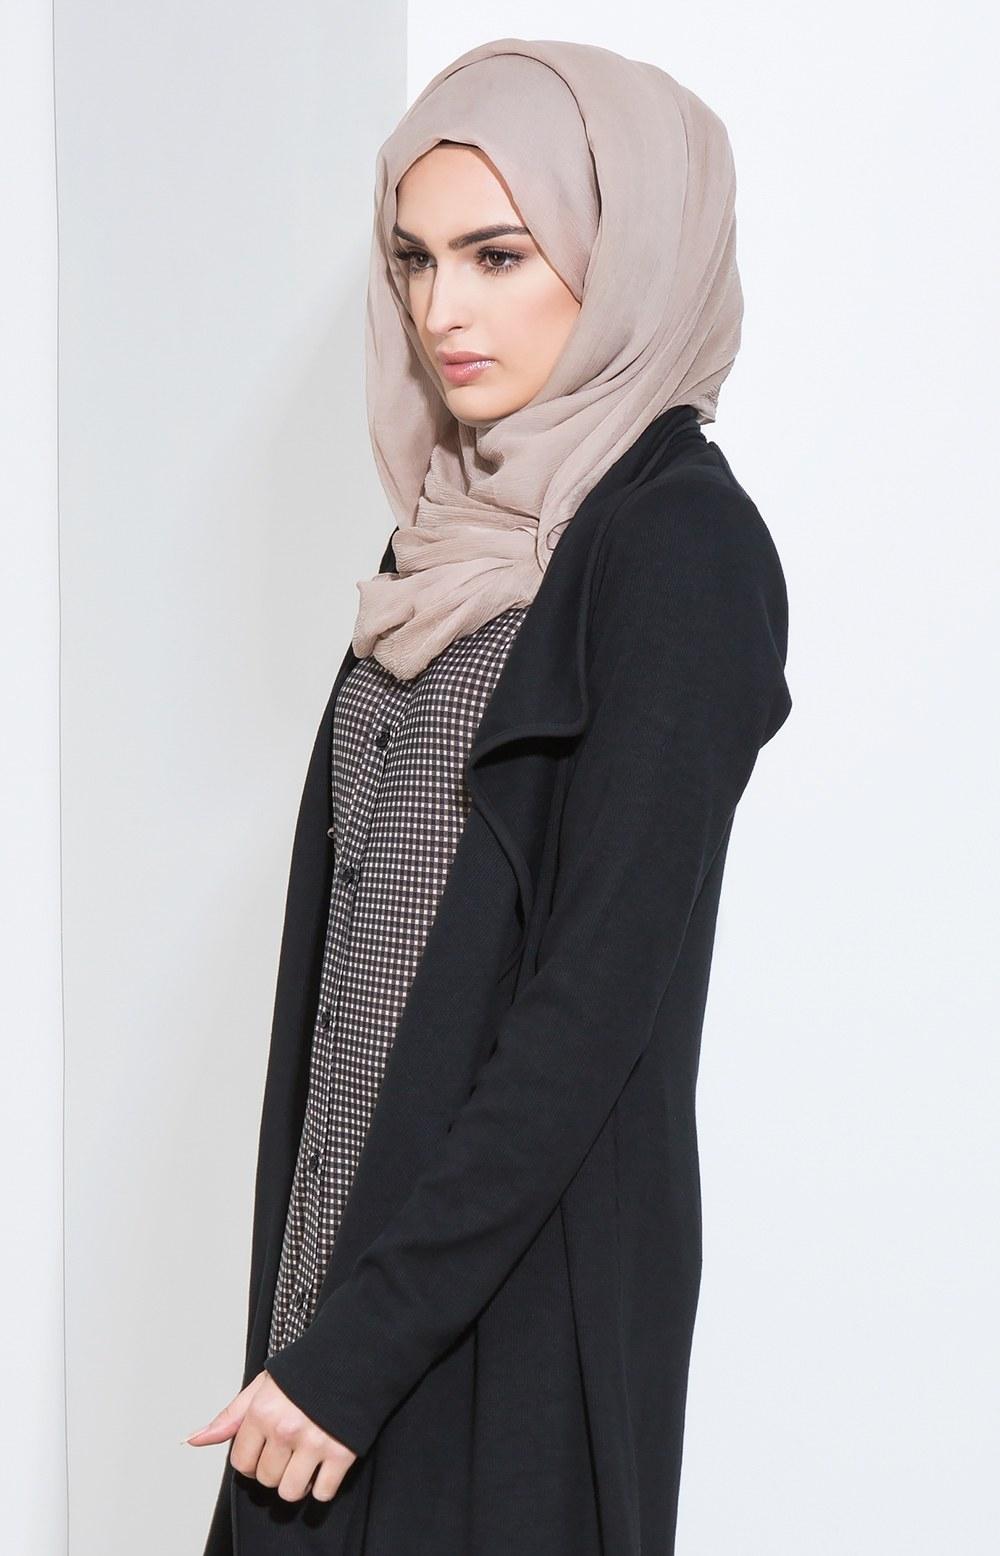 Inspirasi Style Baju Lebaran Dddy 25 Trend Model Baju Muslim Lebaran 2018 Simple & Modis